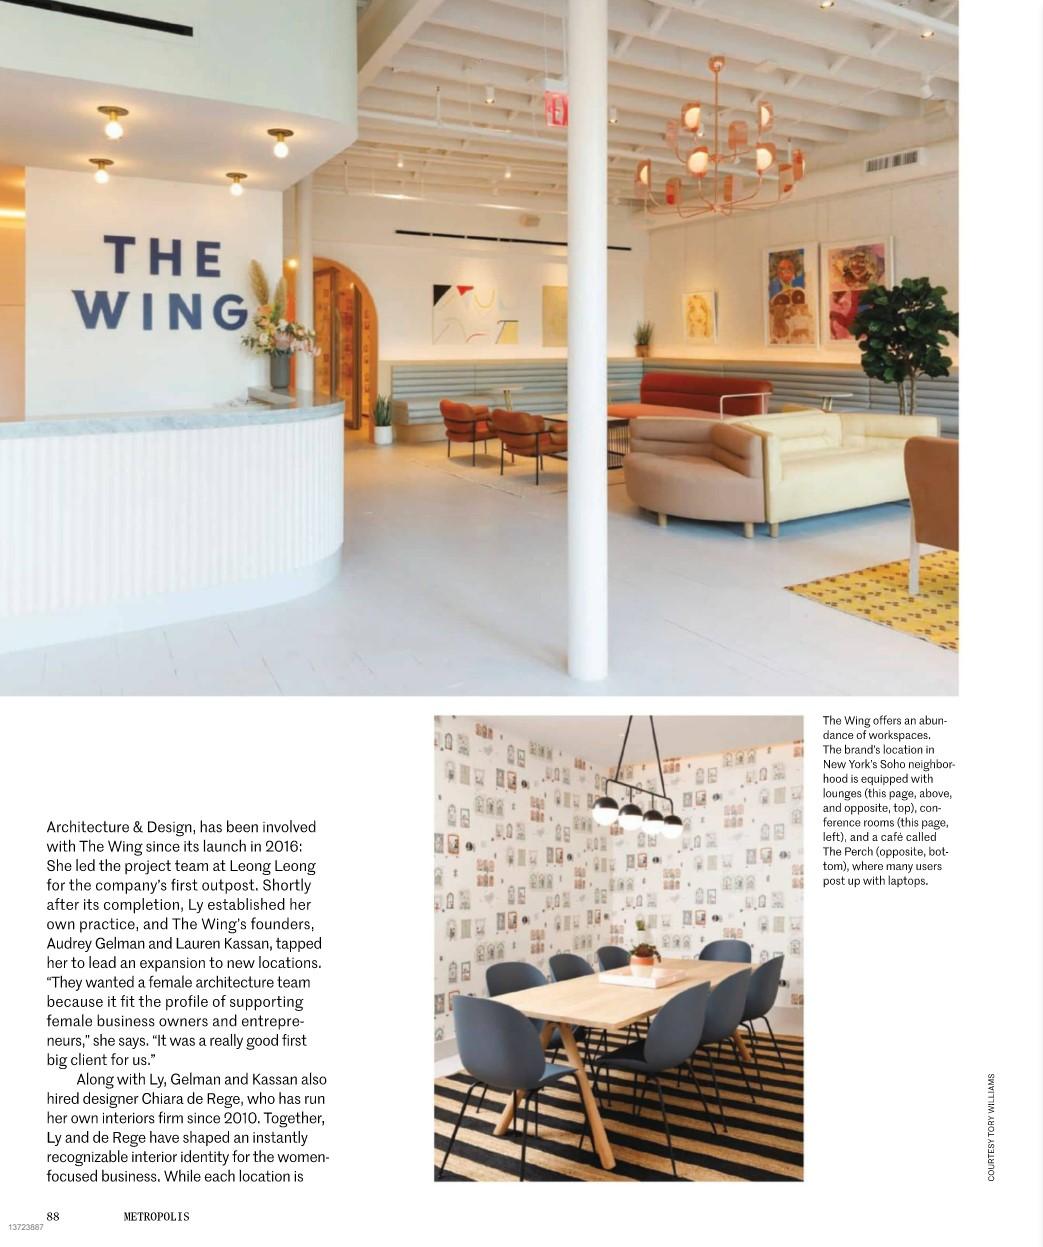 Screenshot_2019-08-27 Metropolis Magazine - July August 2019 Digital Magazine from Magzter - World's Largest Digital Newsst[...].jpg